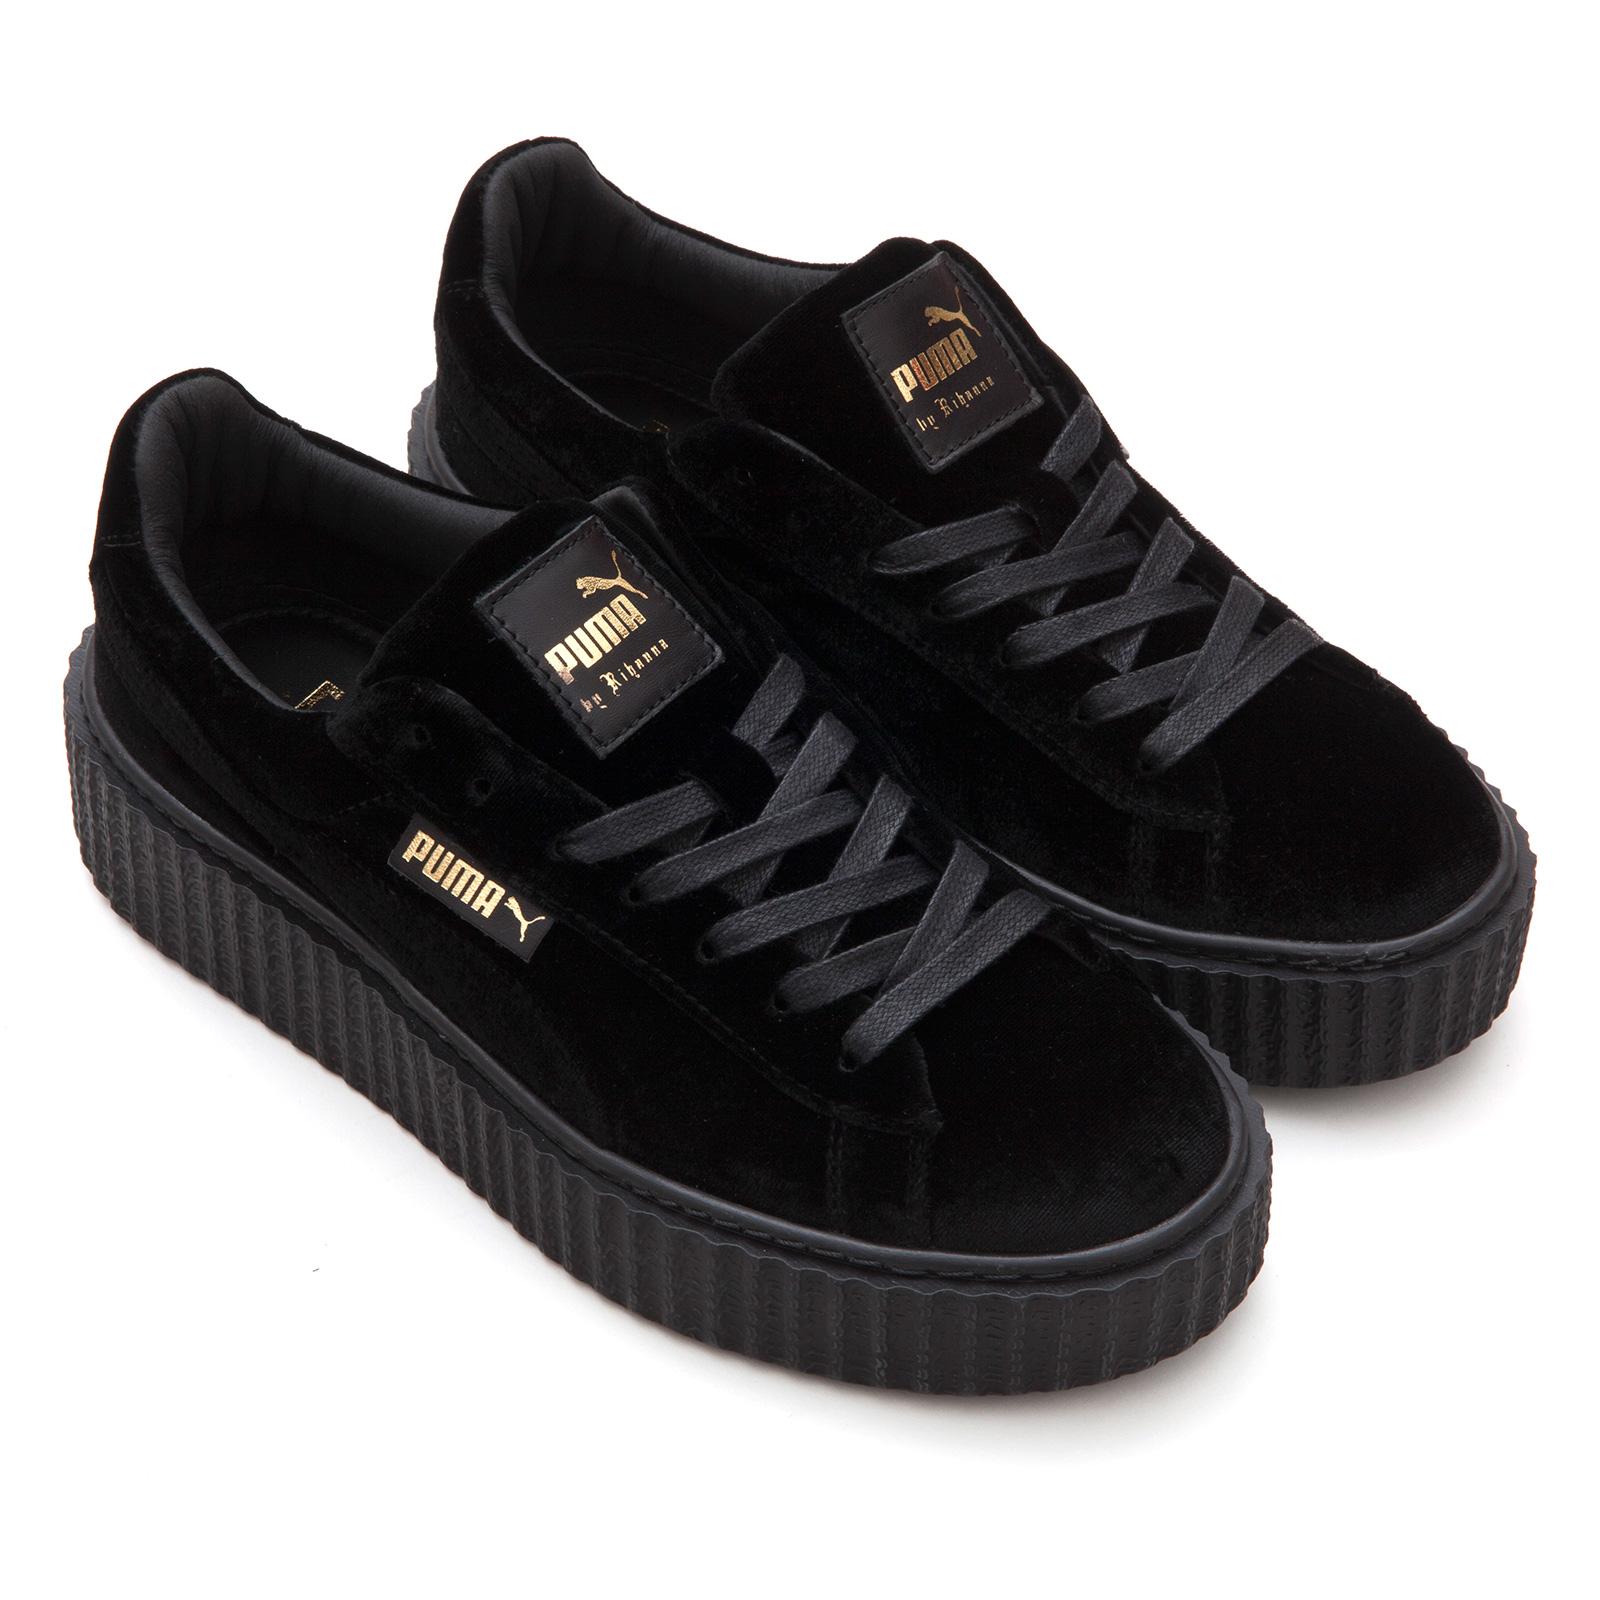 Puma Creeper Velvet Womens Fashion Sneakers Puma Black 8 US   6 UK ... 8c676e3236